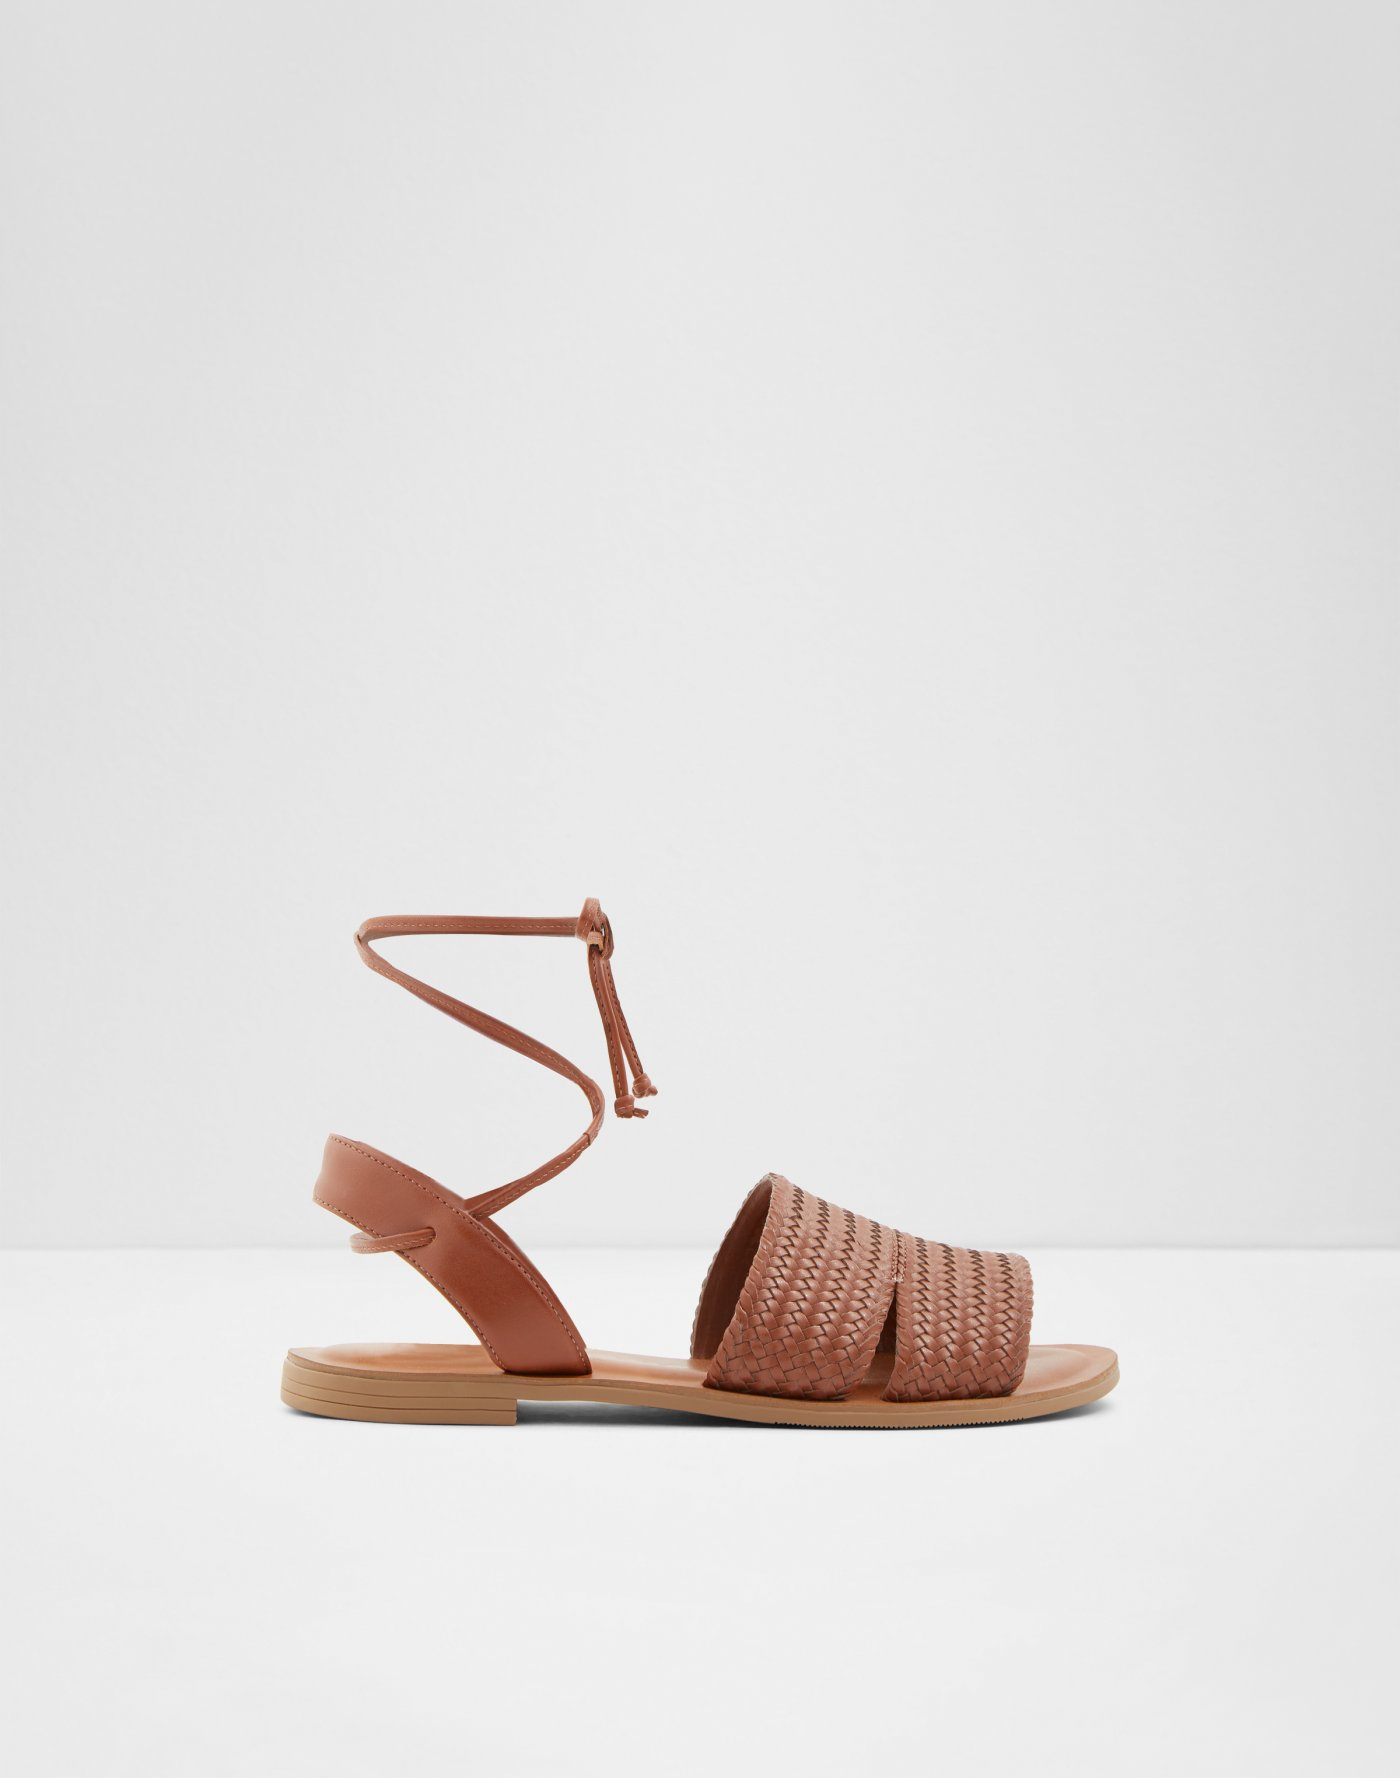 dac1fb07f6 Sandals | Aldoshoes.com US